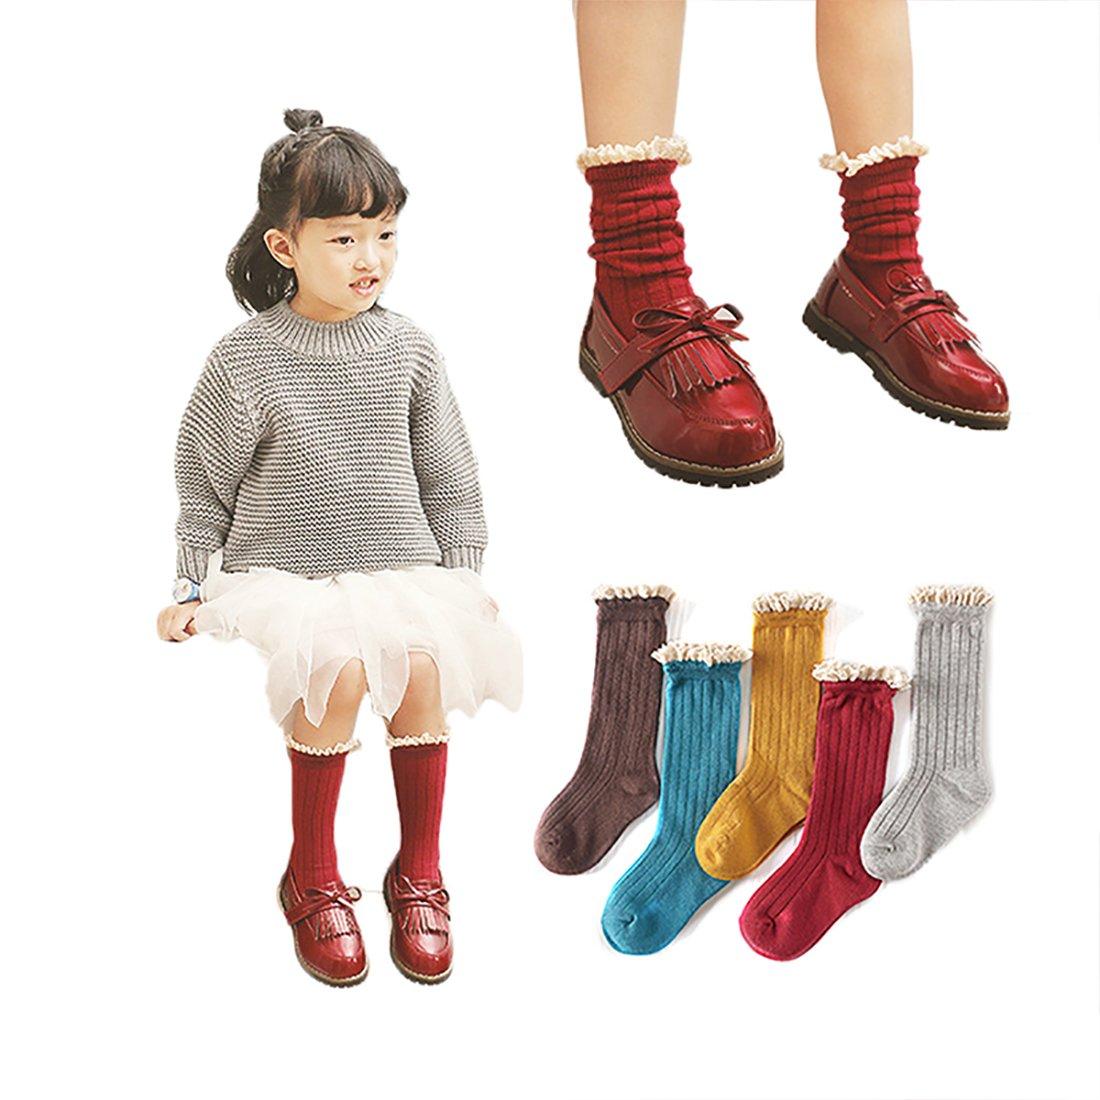 2-5 Years Anti Slip Non Skid Cotton Socks Menghao 6 Pairs Kids Socks Cartoon Cat